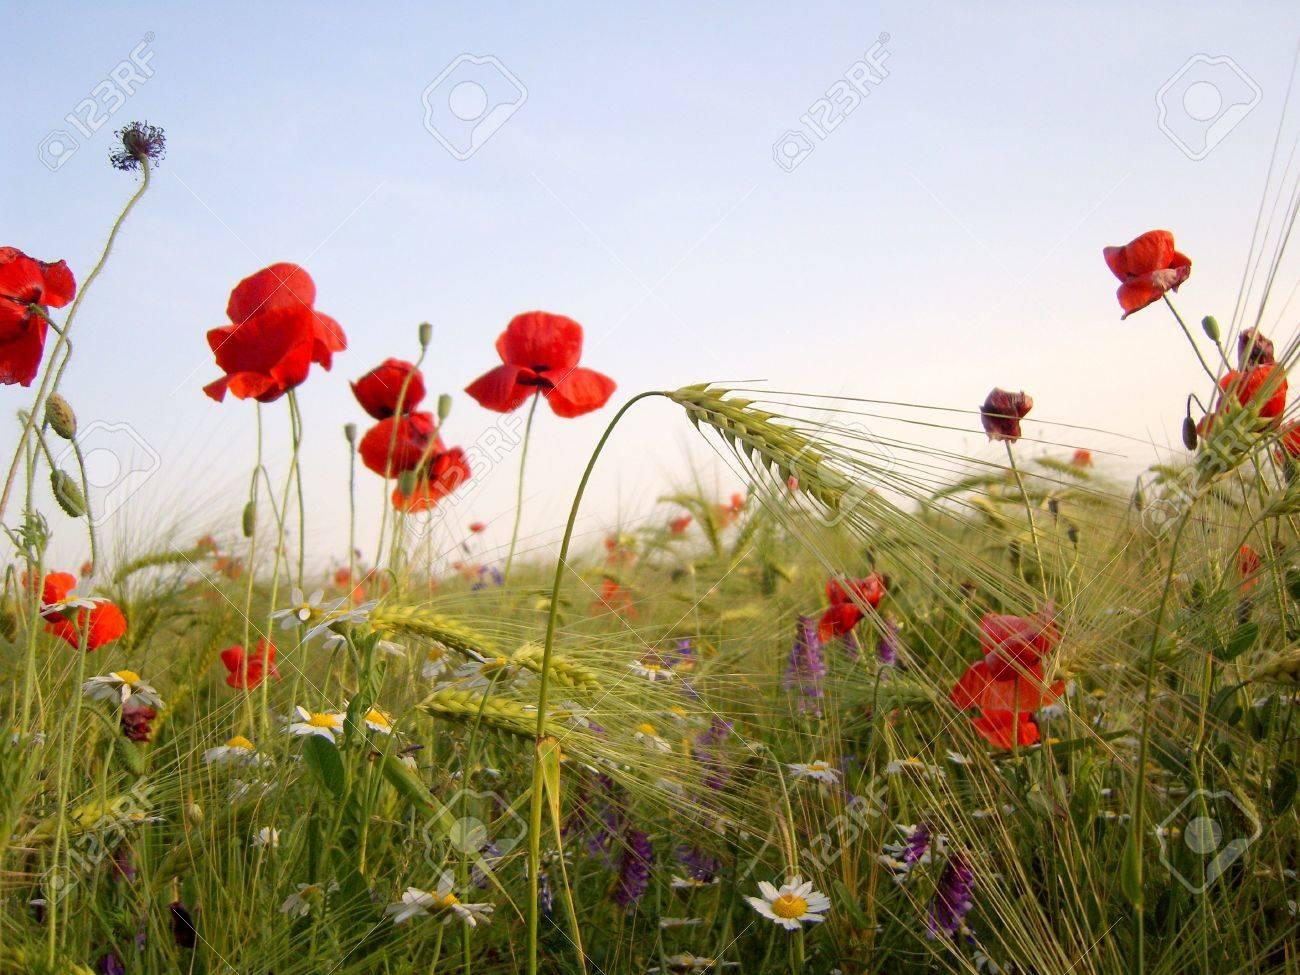 Wheat ears and wild poppy flowers in wheat field. Stock Photo - 3296872